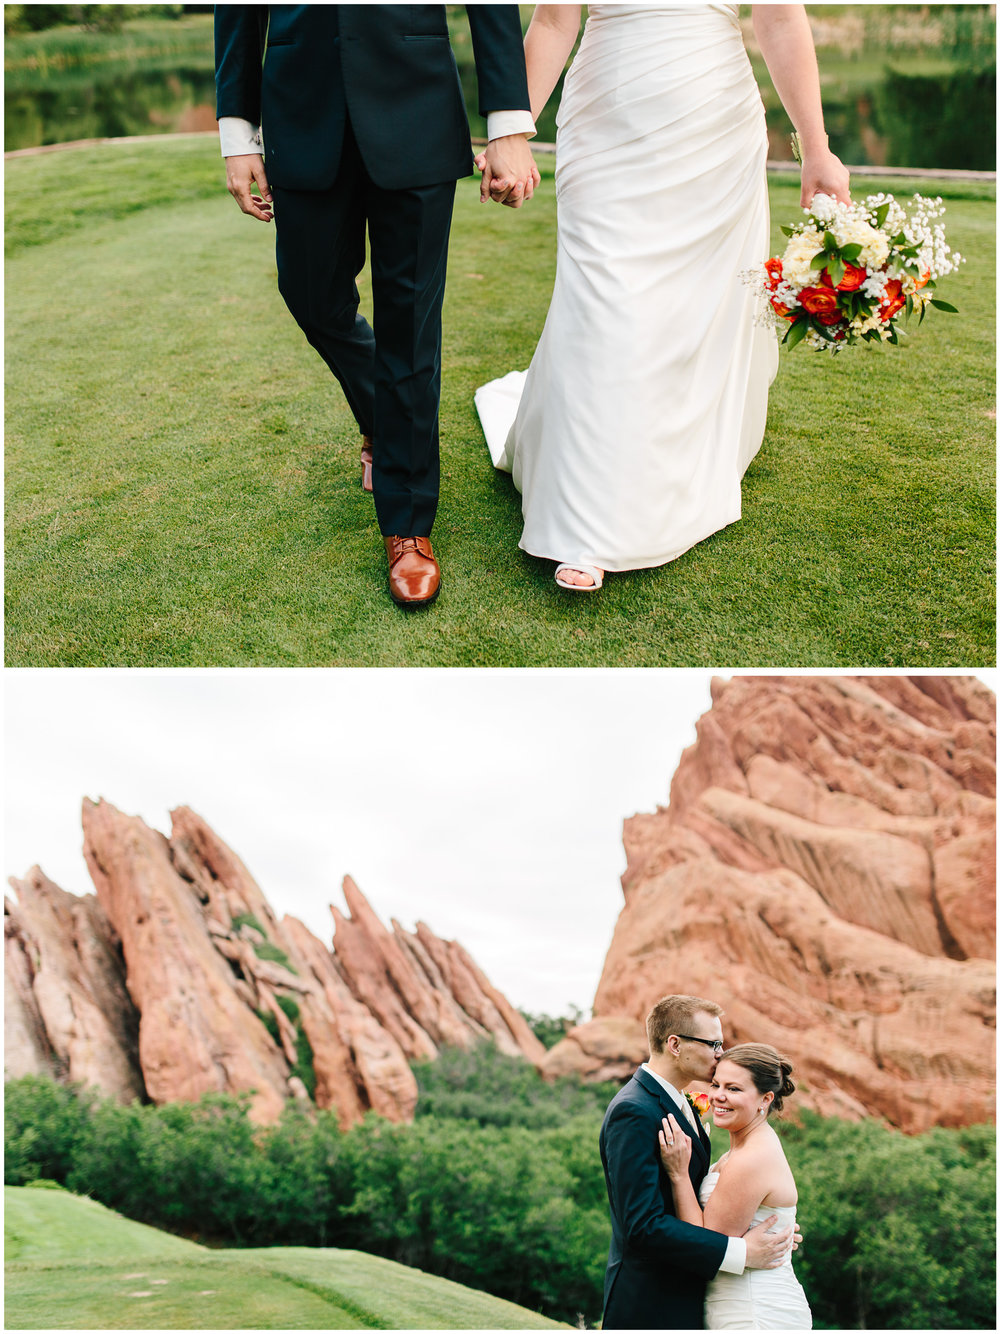 littleton_wedding_44.jpg